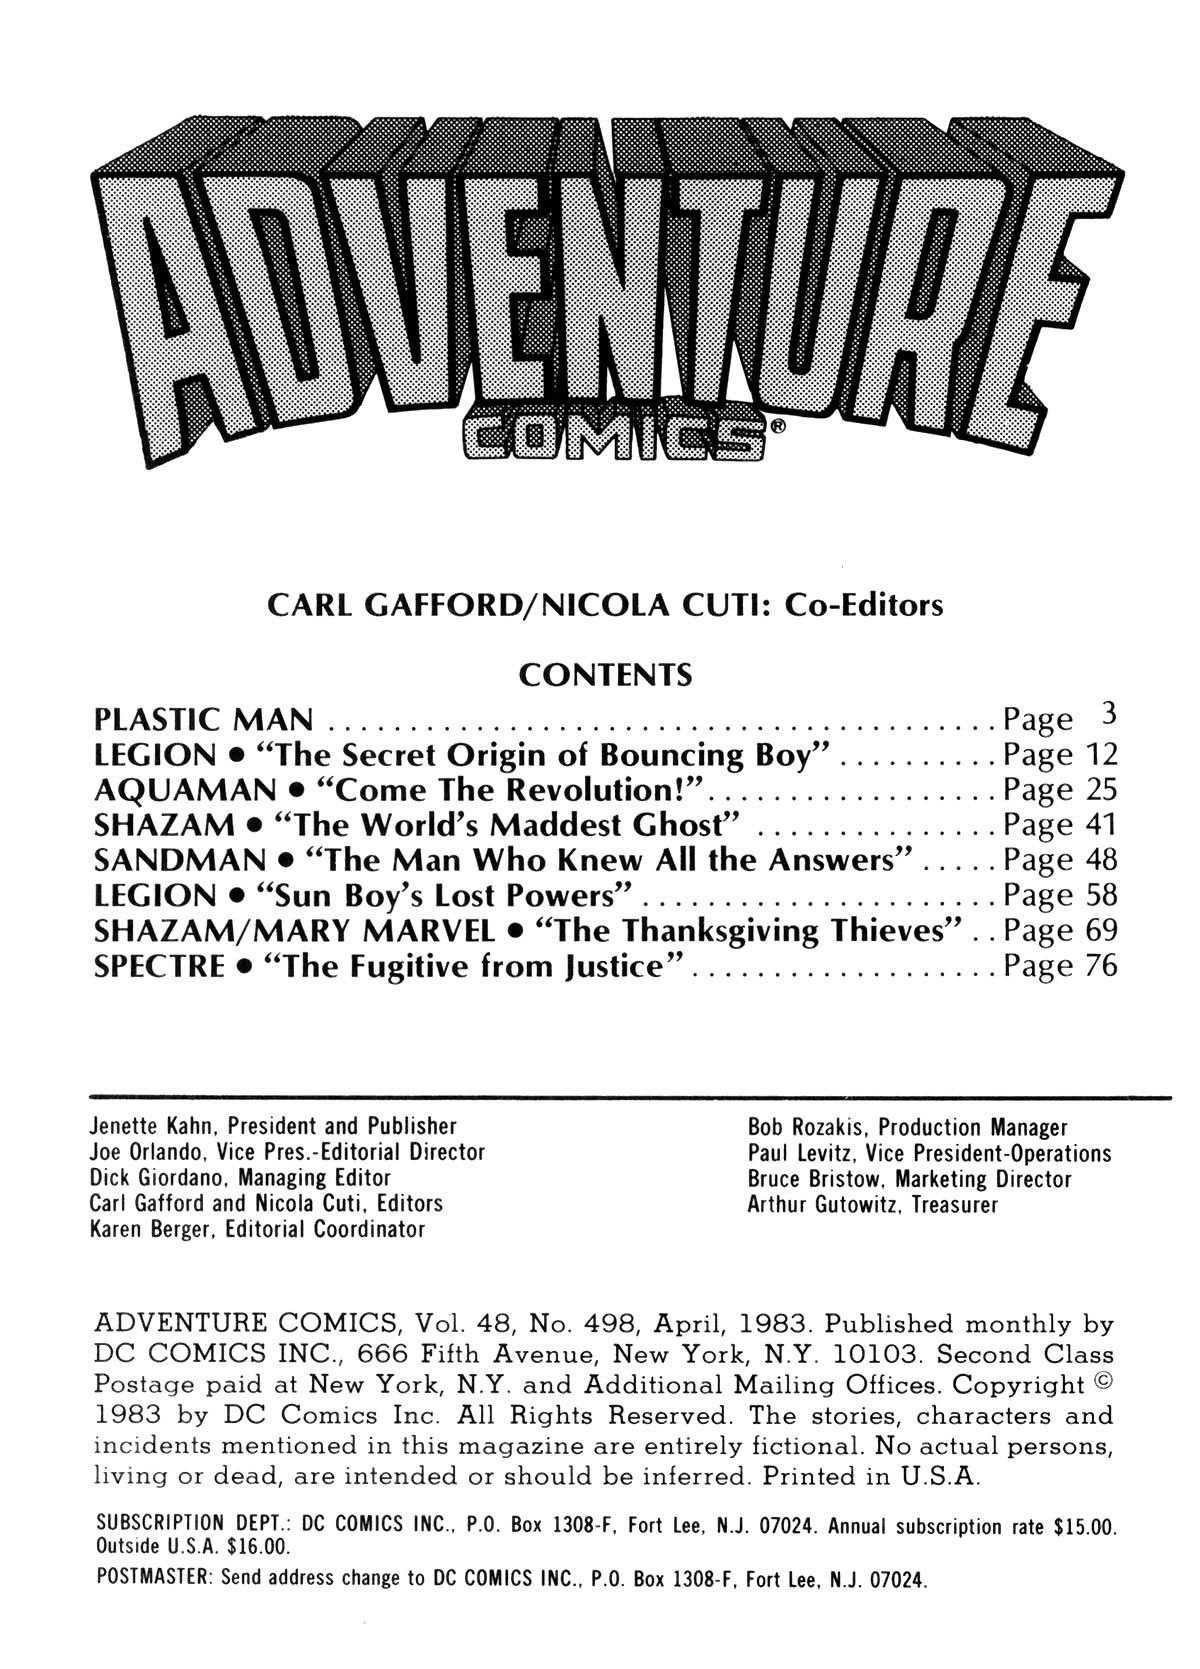 Read online Adventure Comics (1938) comic -  Issue #498 - 2